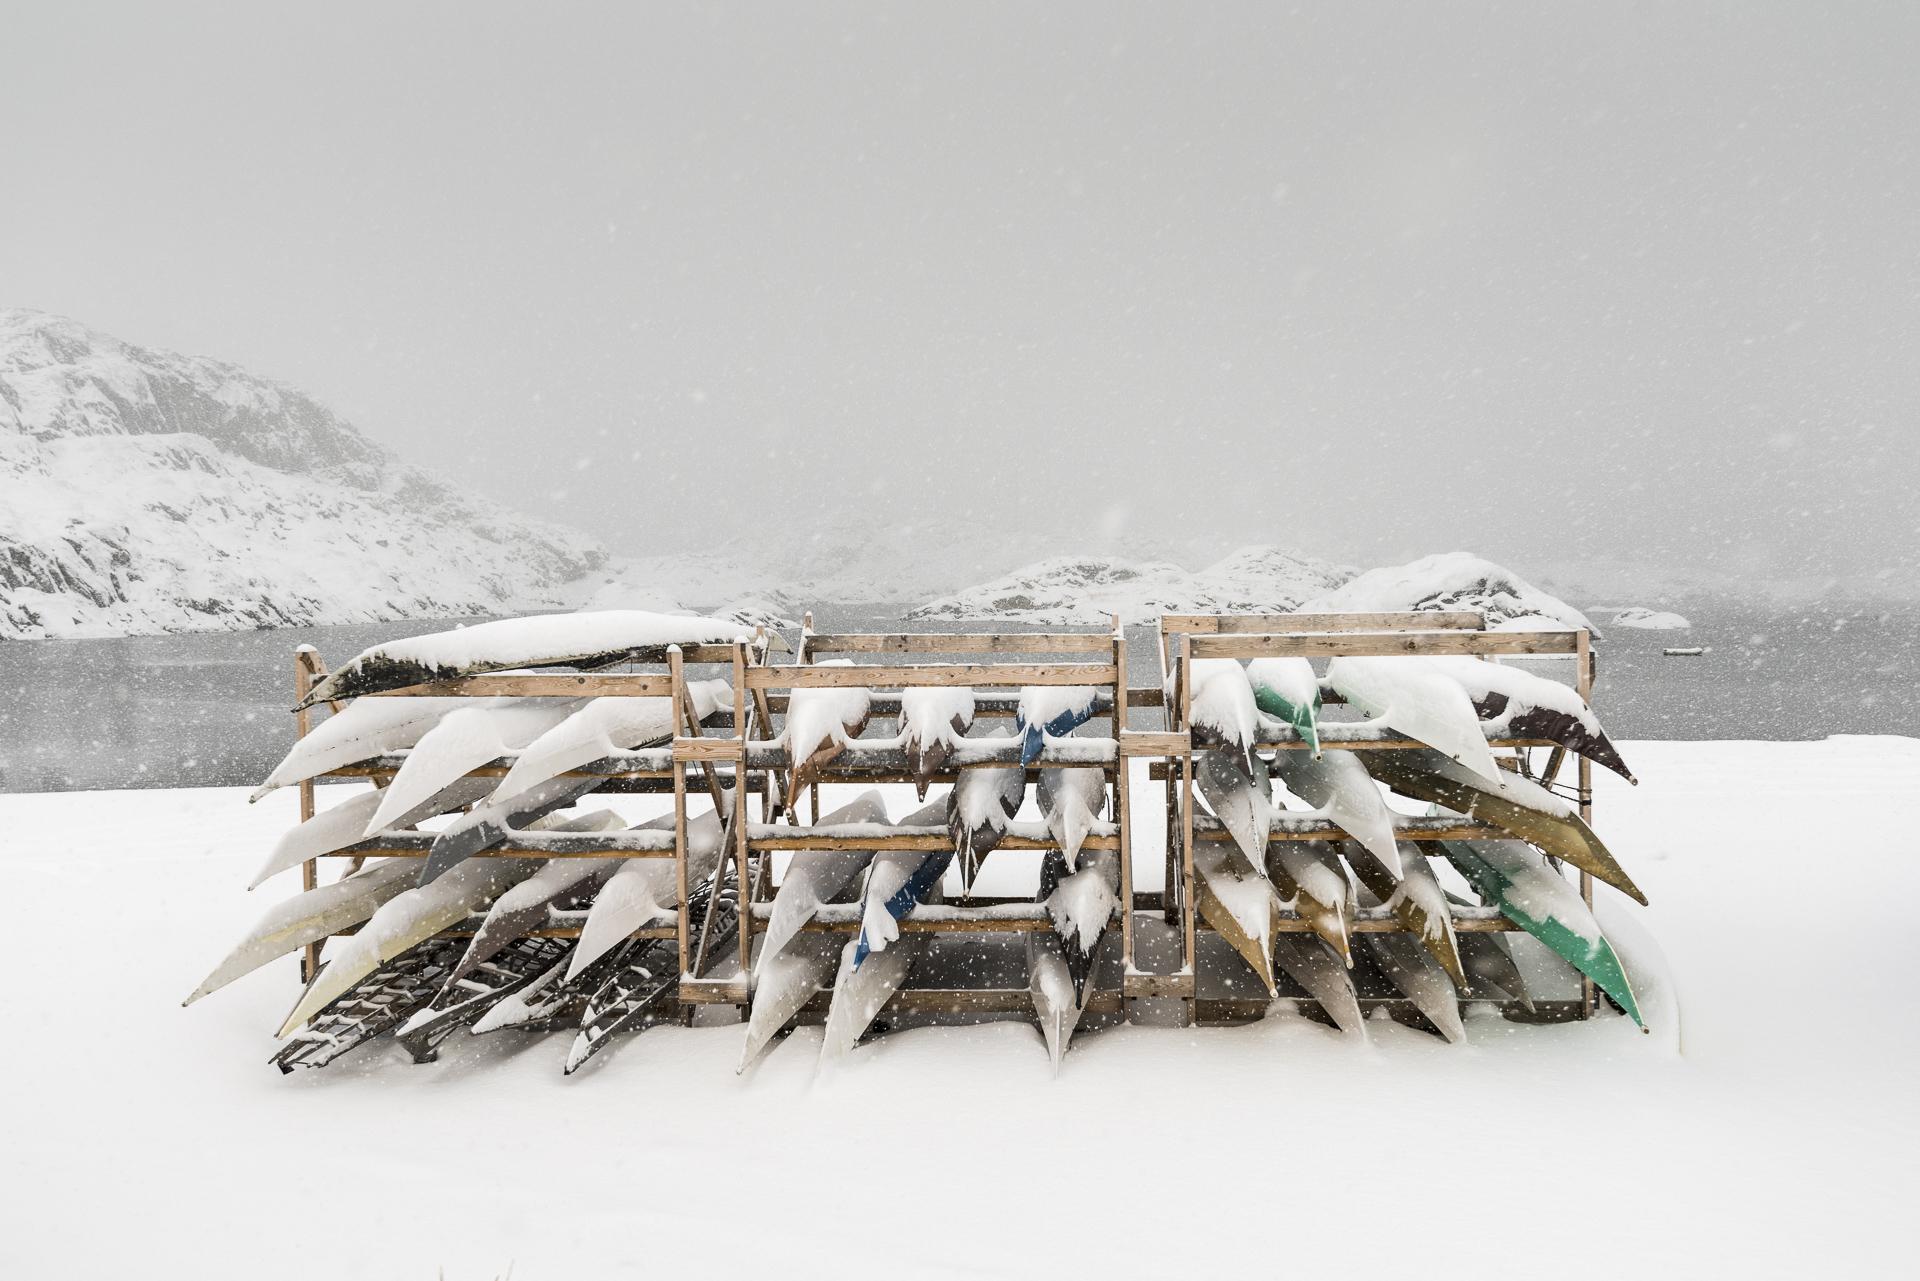 13.Defibaugh_Greenland_Sisimiut_119.jpg